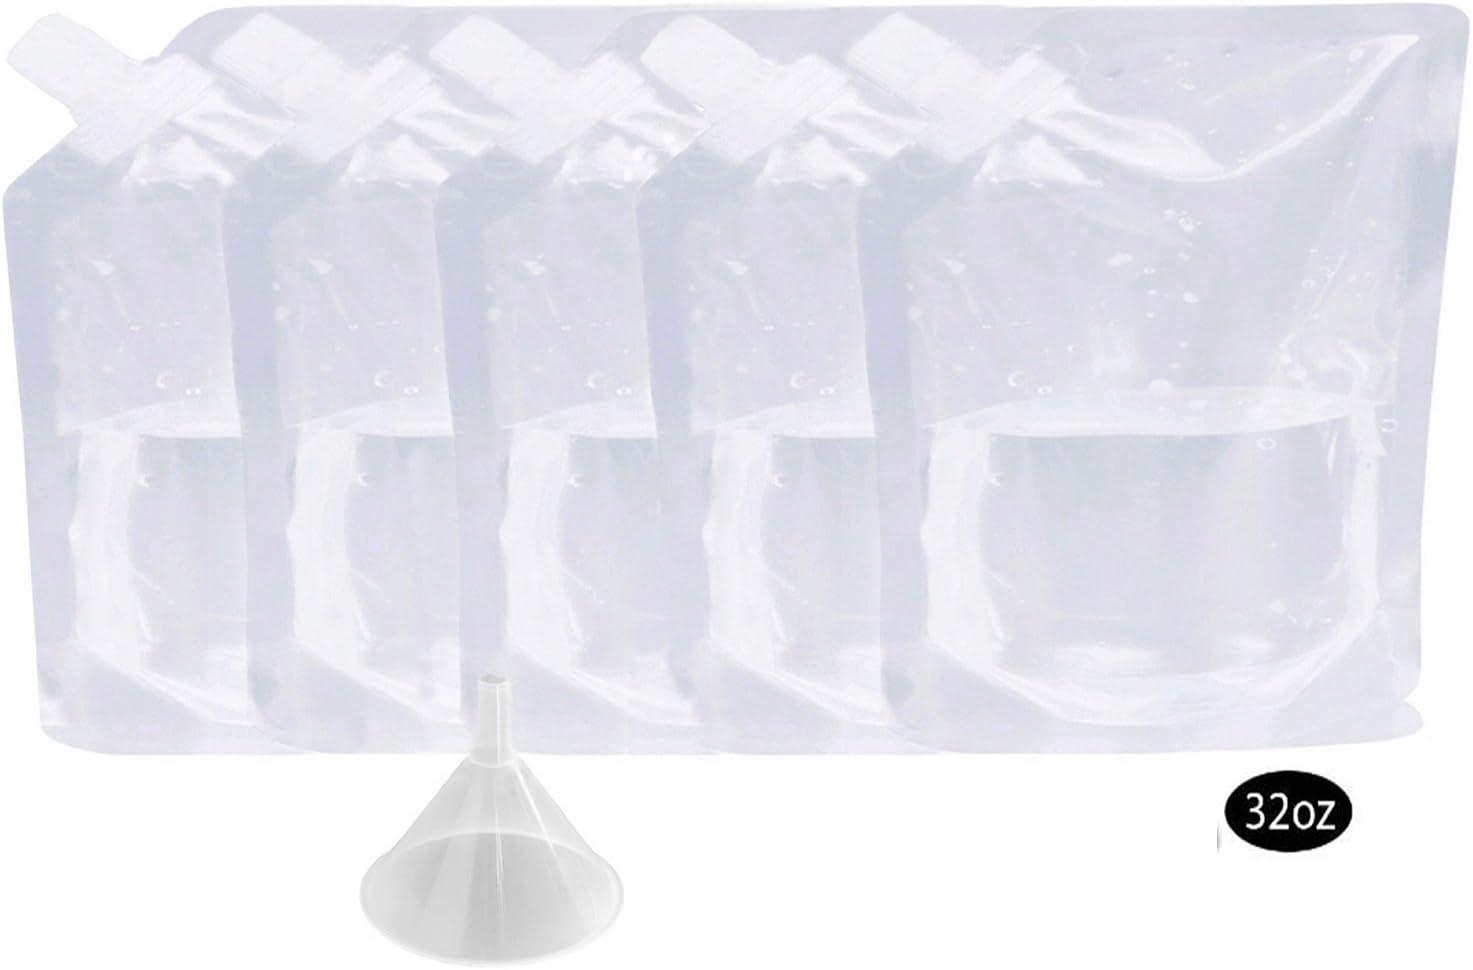 foucomeカクテルキャディクルーズLiquorバッグキットfor alcohol-再利用可能な& concealable Liquorバッグ1 x 32oz + Funne含ま 20180403010